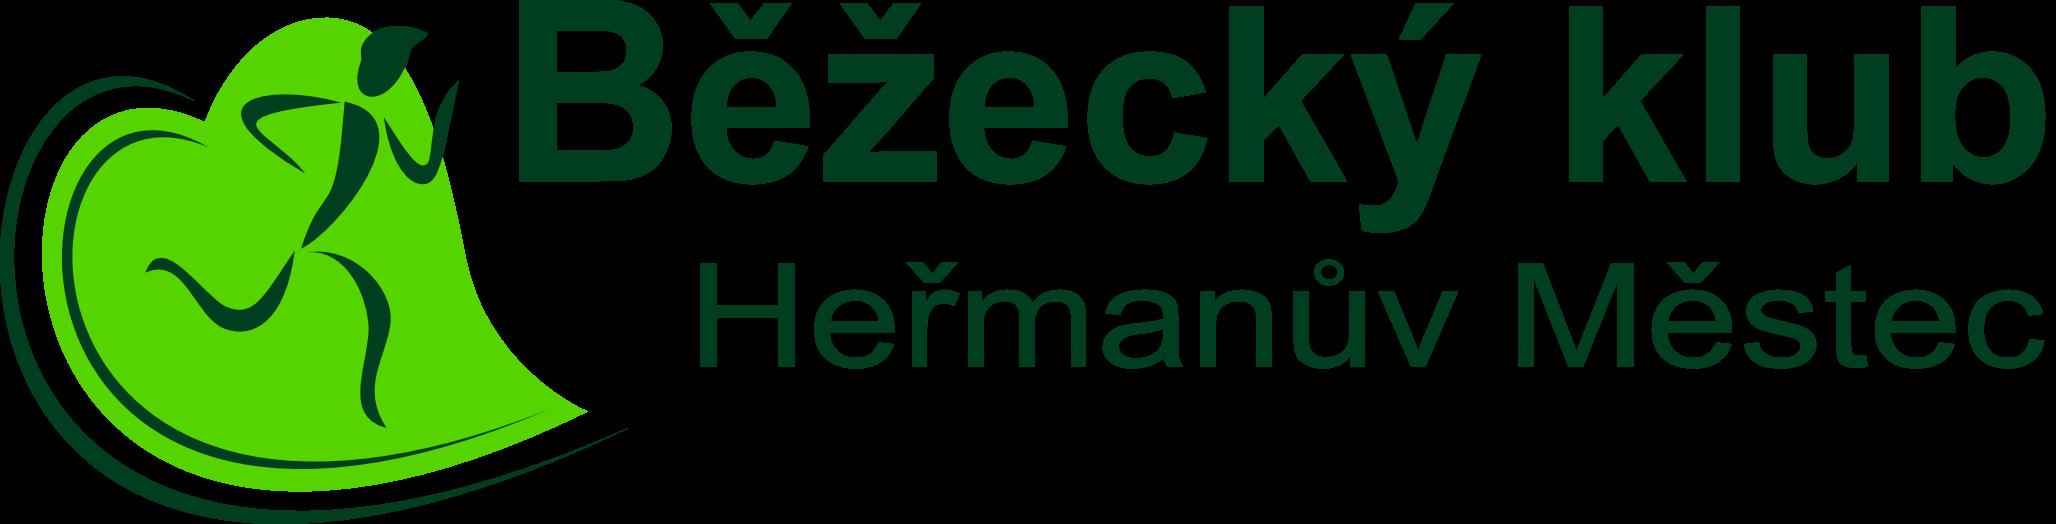 Běžecký klub Heřmanův Městec